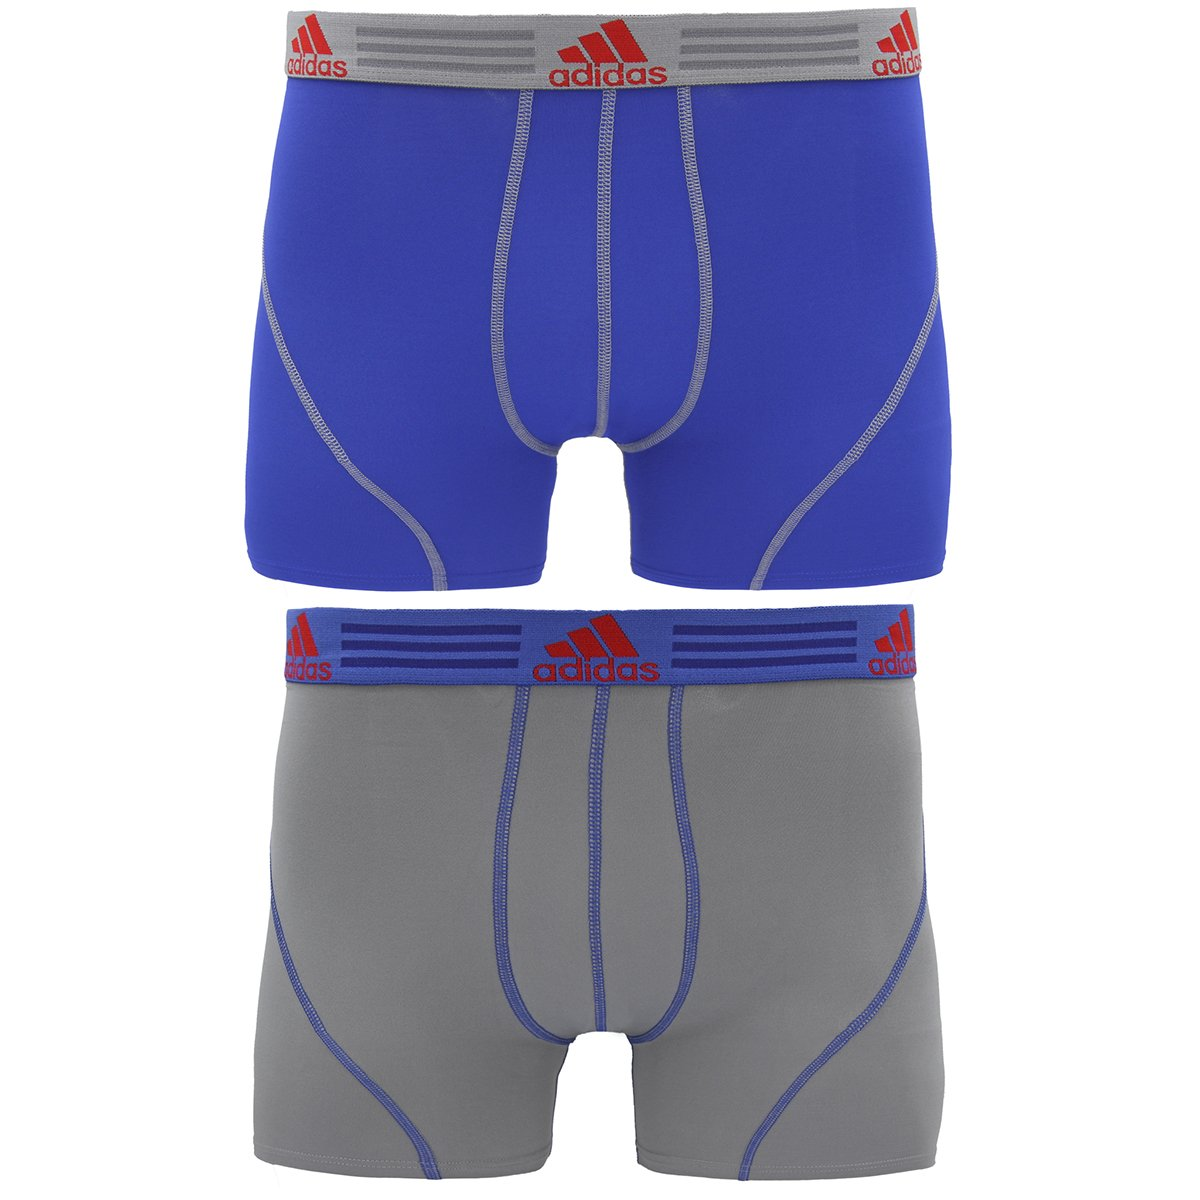 566d0e460673 Galleon - Adidas Men s Sport Performance Climalite Trunk Underwear (2  Pack)